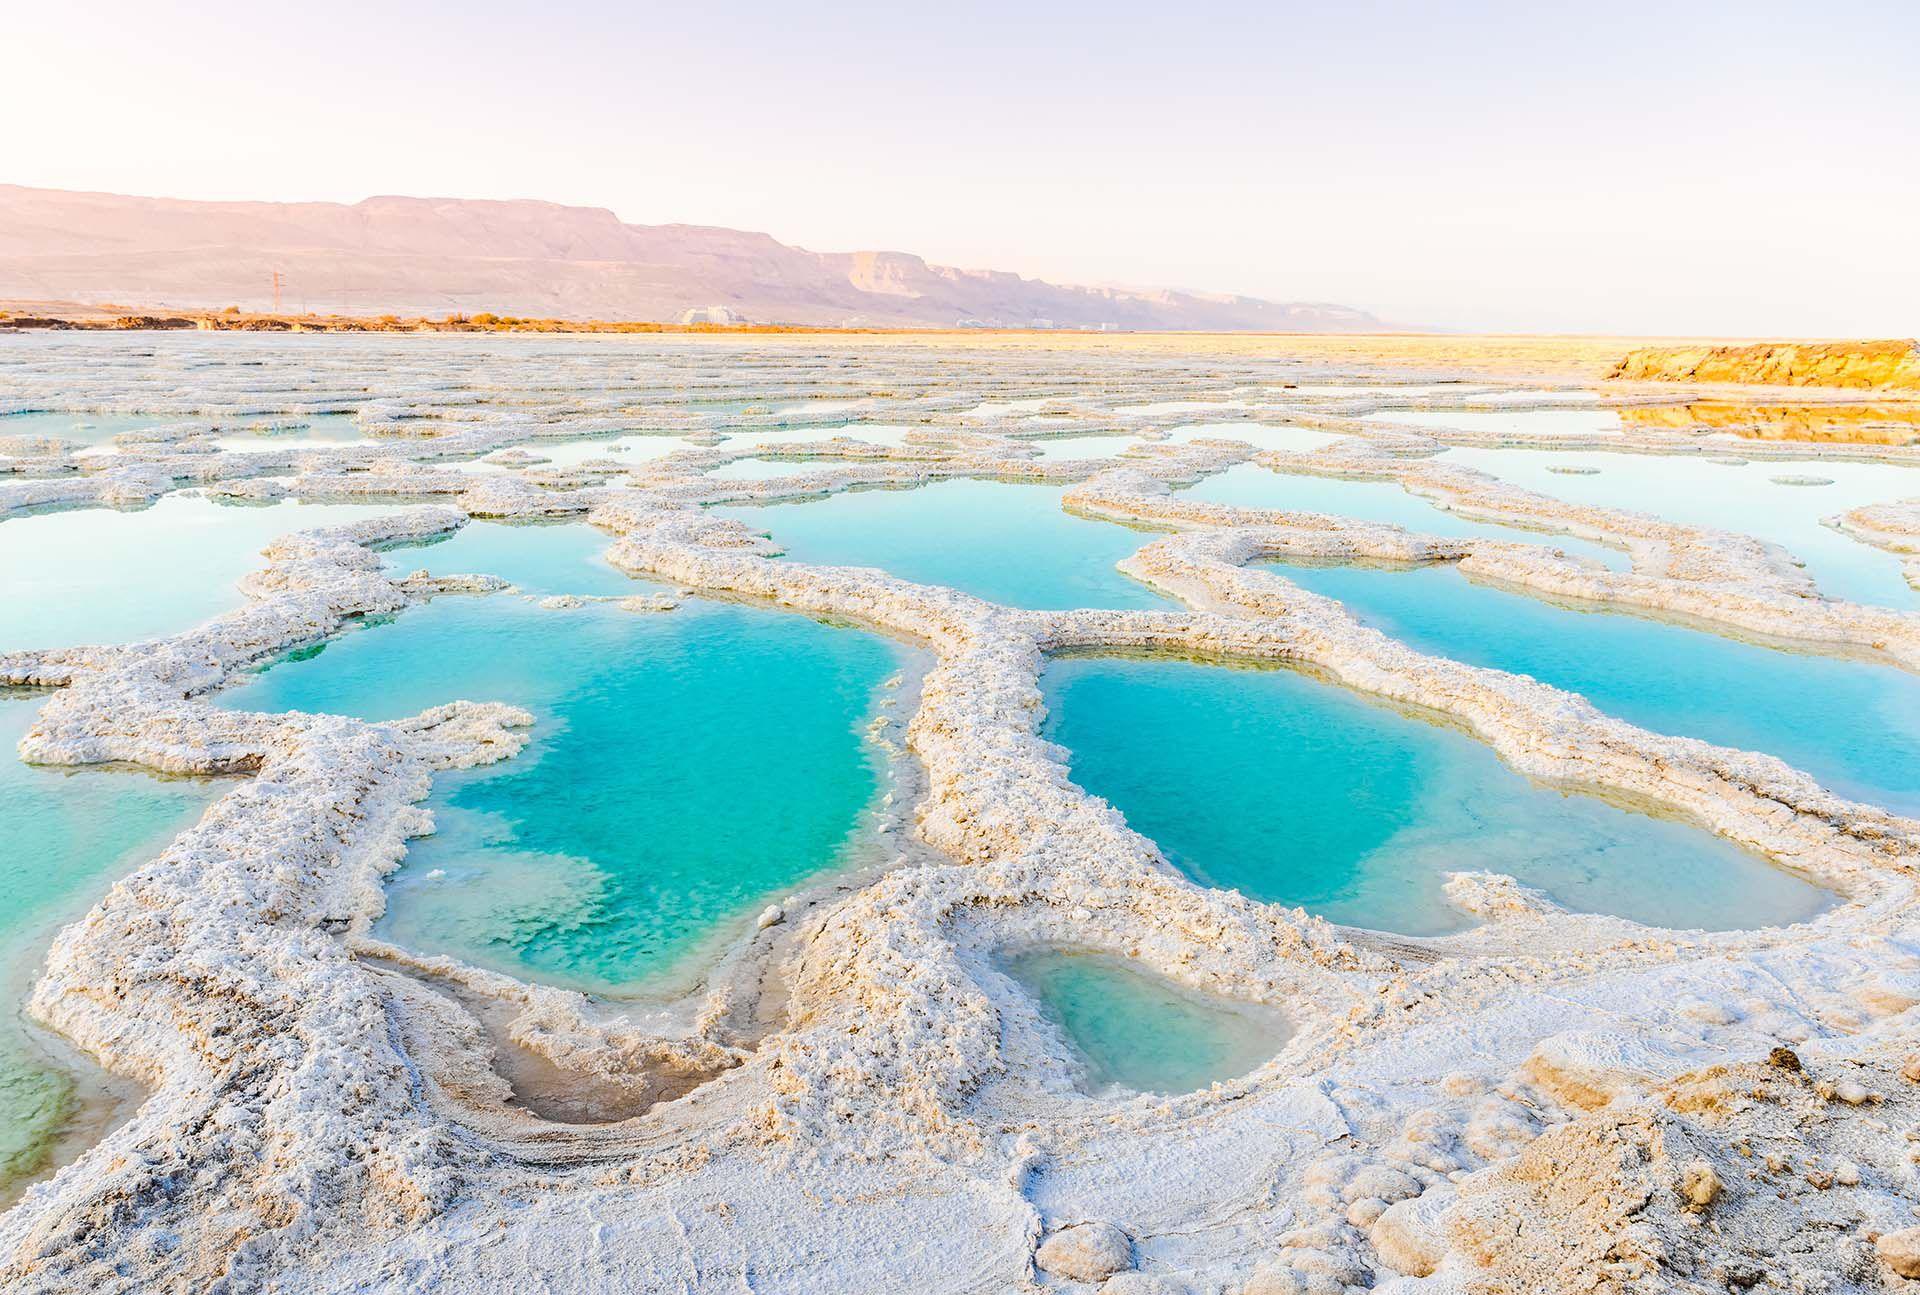 20 maravillas naturales récord del mundo